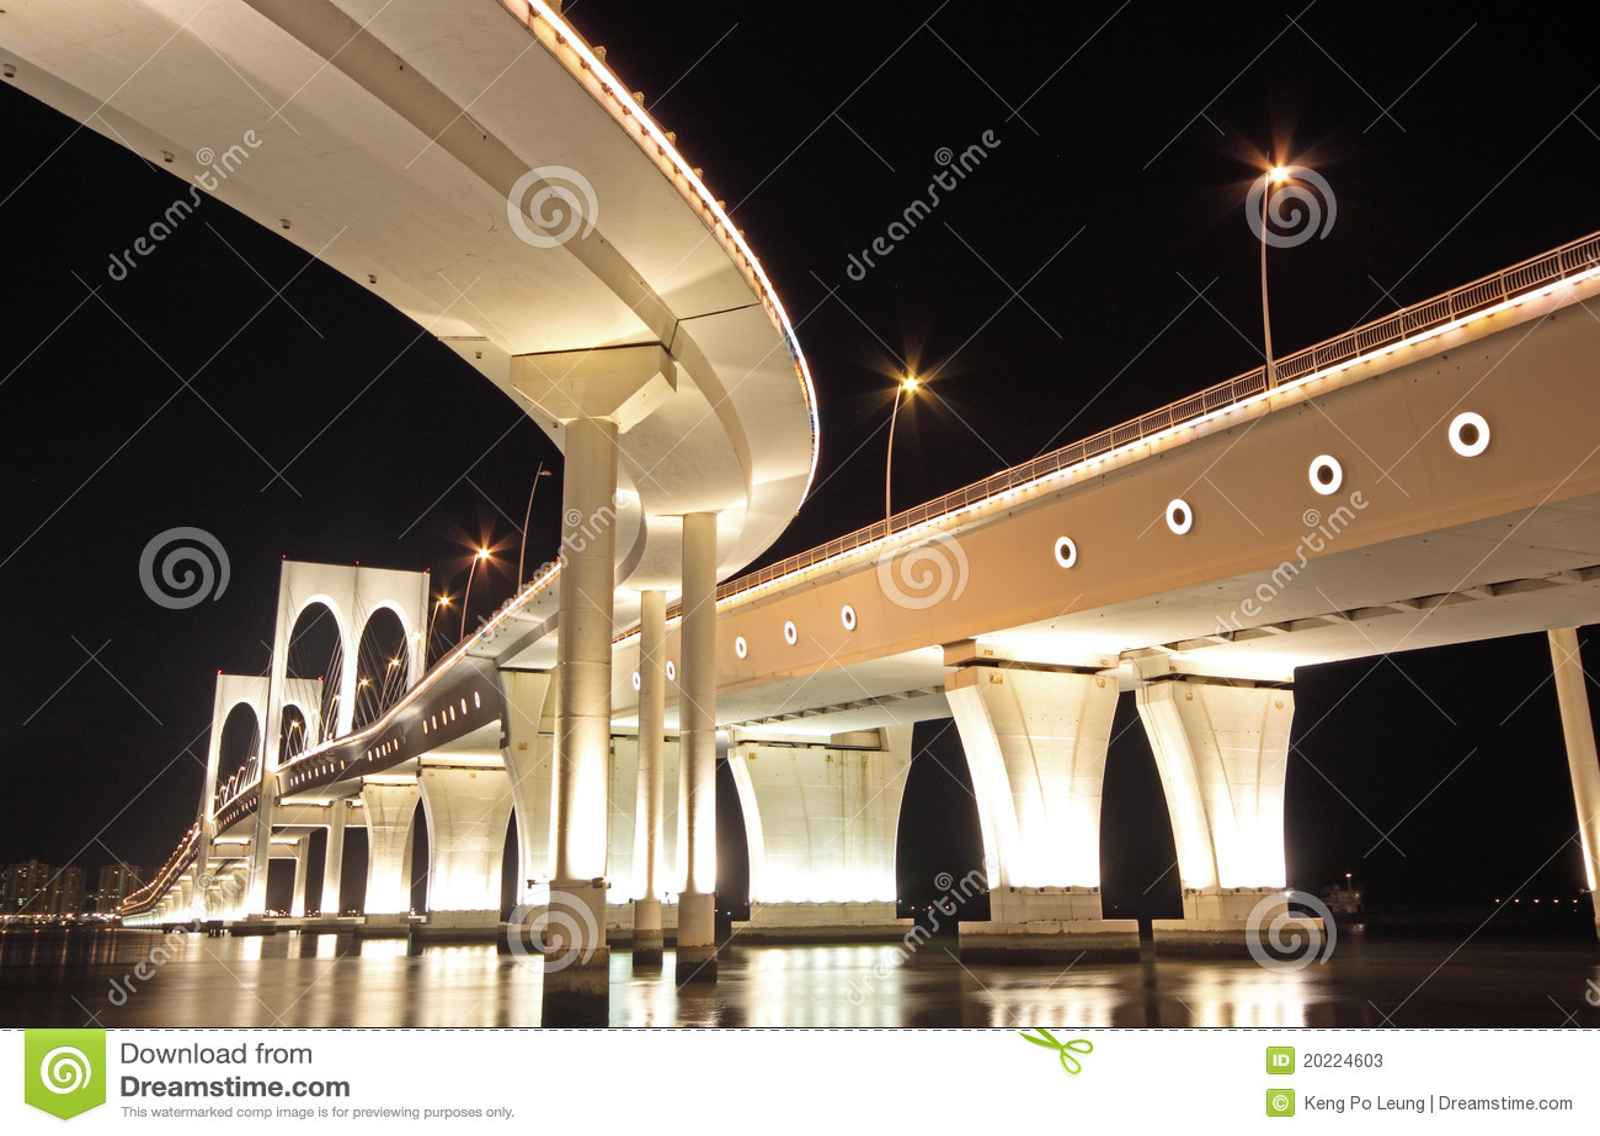 Sai范・ bridge